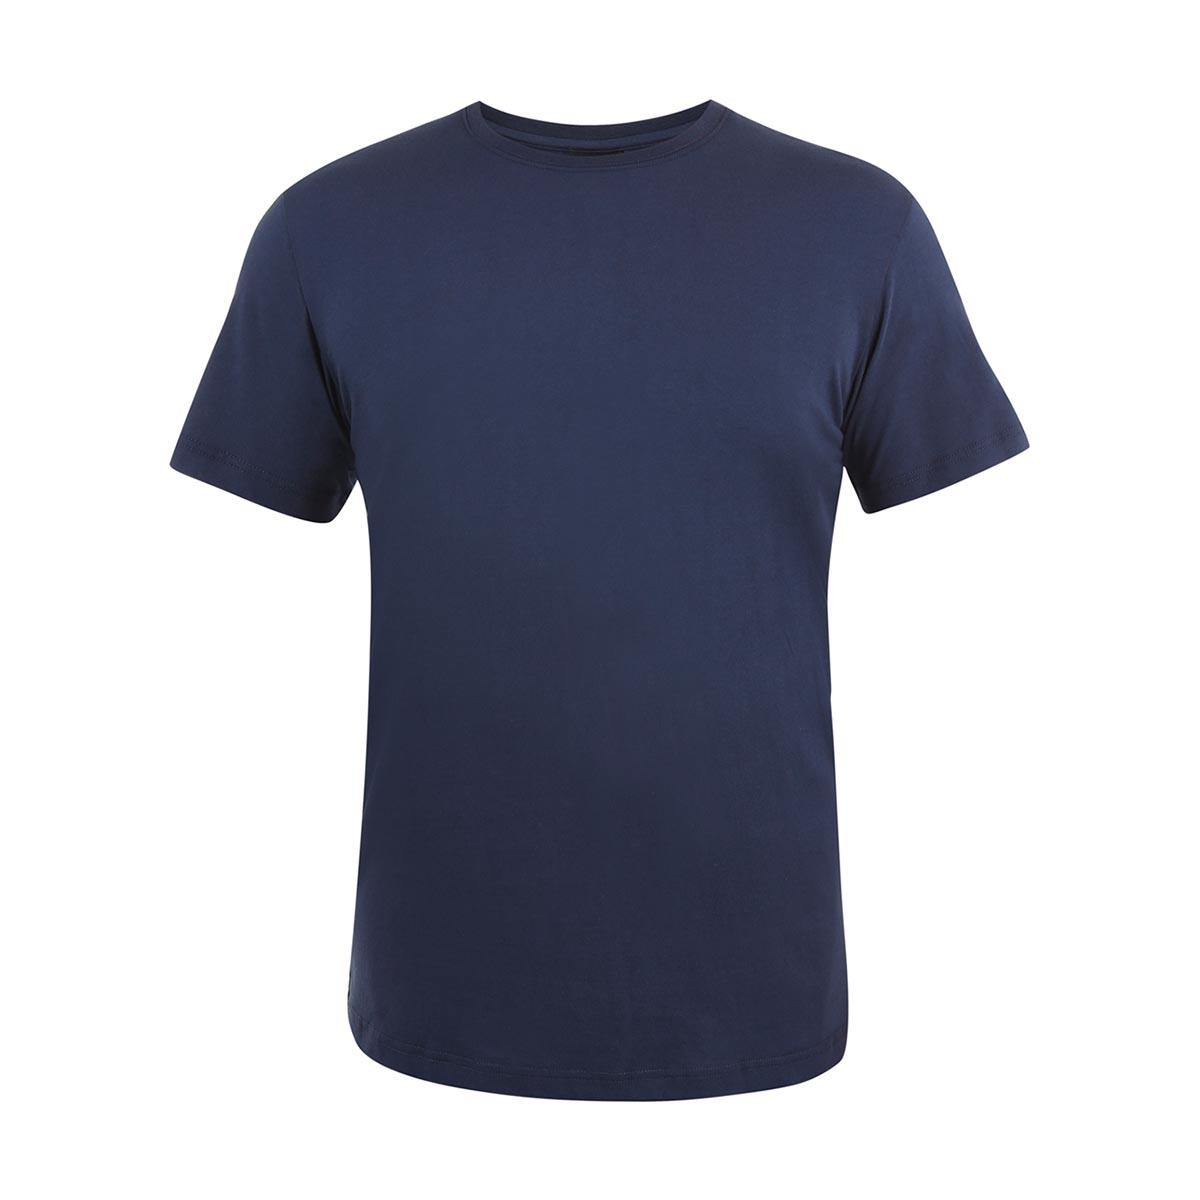 Kids Navy Canterbury Teamwear Team Plain Tee Shirt ...